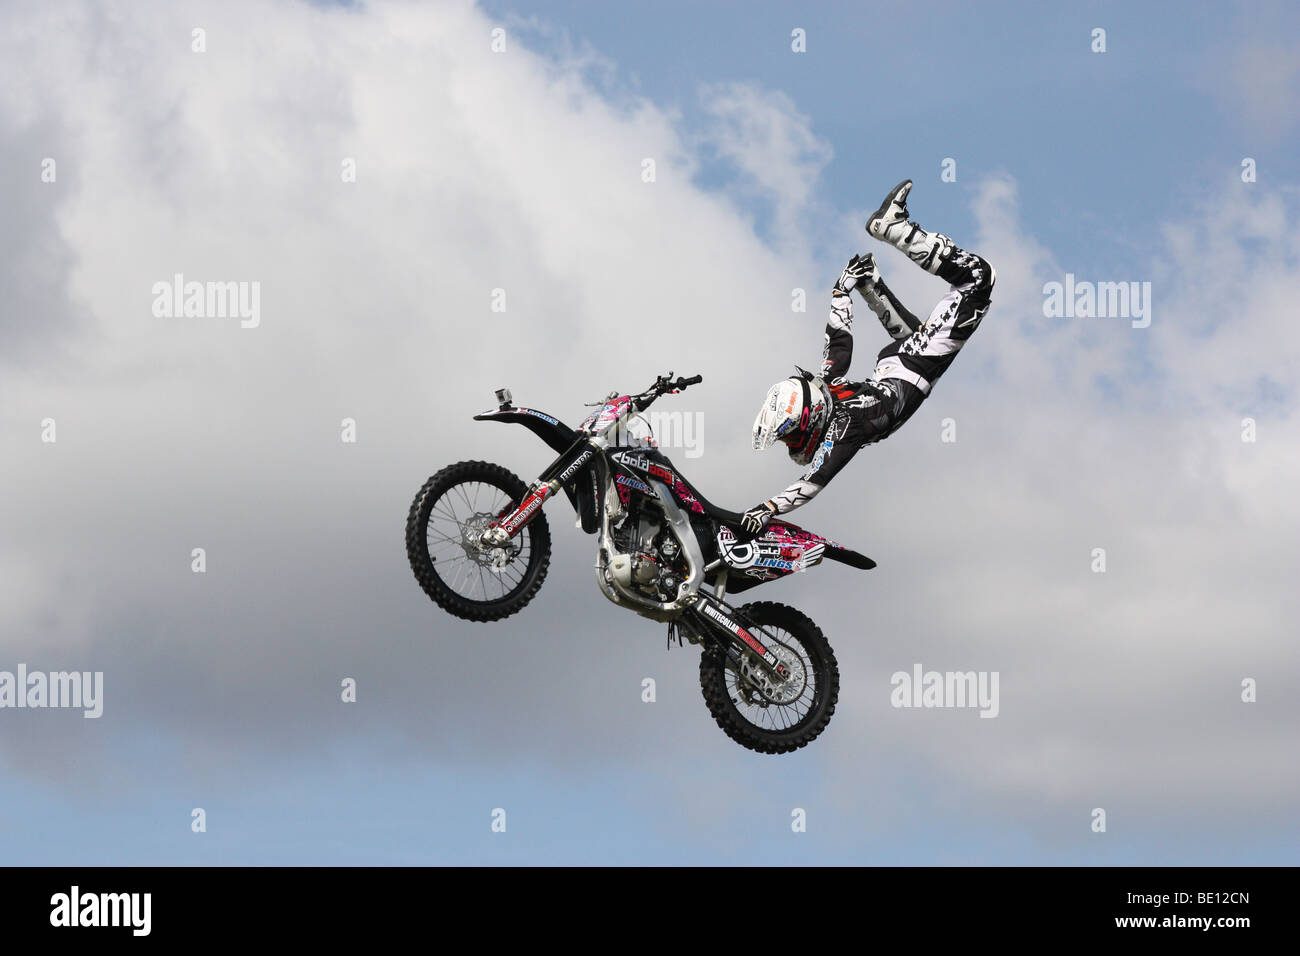 Motor cycle stunt display Romsey Show Hampshire UK 2009 - Stock Image